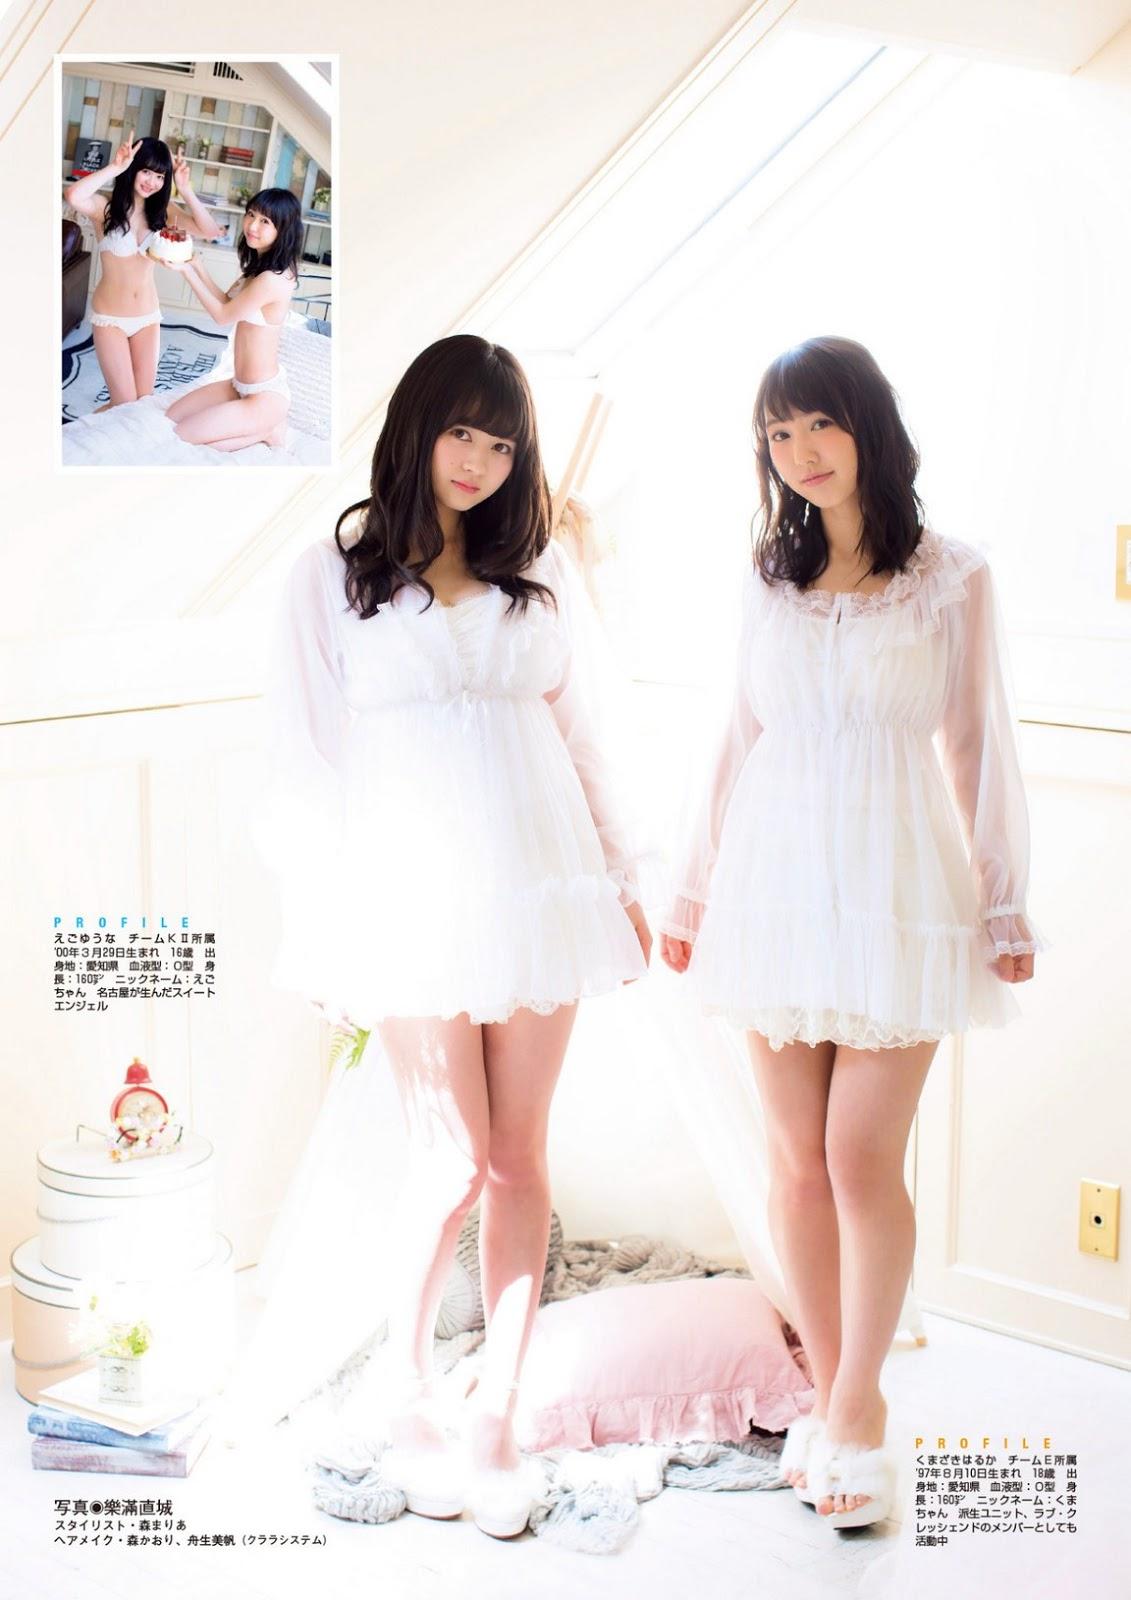 Ego Yuna 江籠裕奈, Kumazaki Haruka 熊崎晴香 SKE48, FLASH Special Gravure BEST 2016.05.25 Kindle Edition